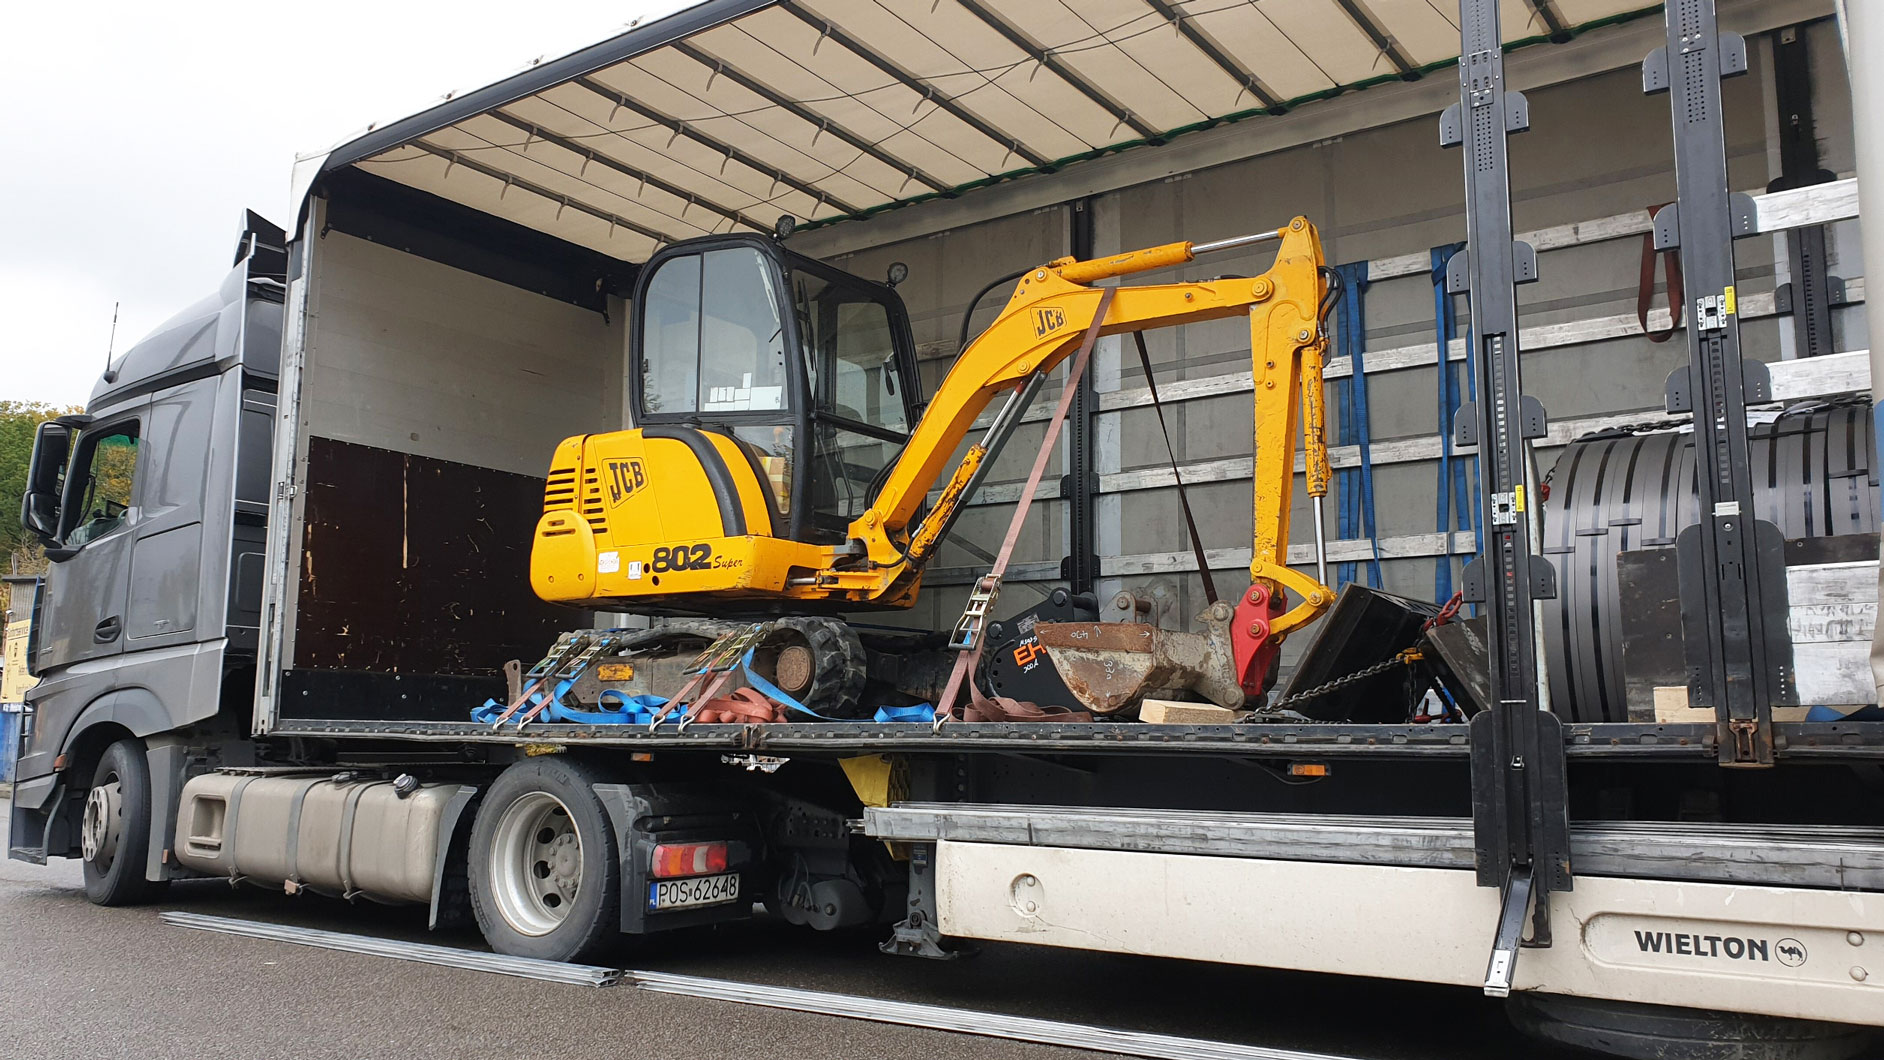 Minibagger JCB 802 JCB802 Lieferung track excavator экскаватор перевозка